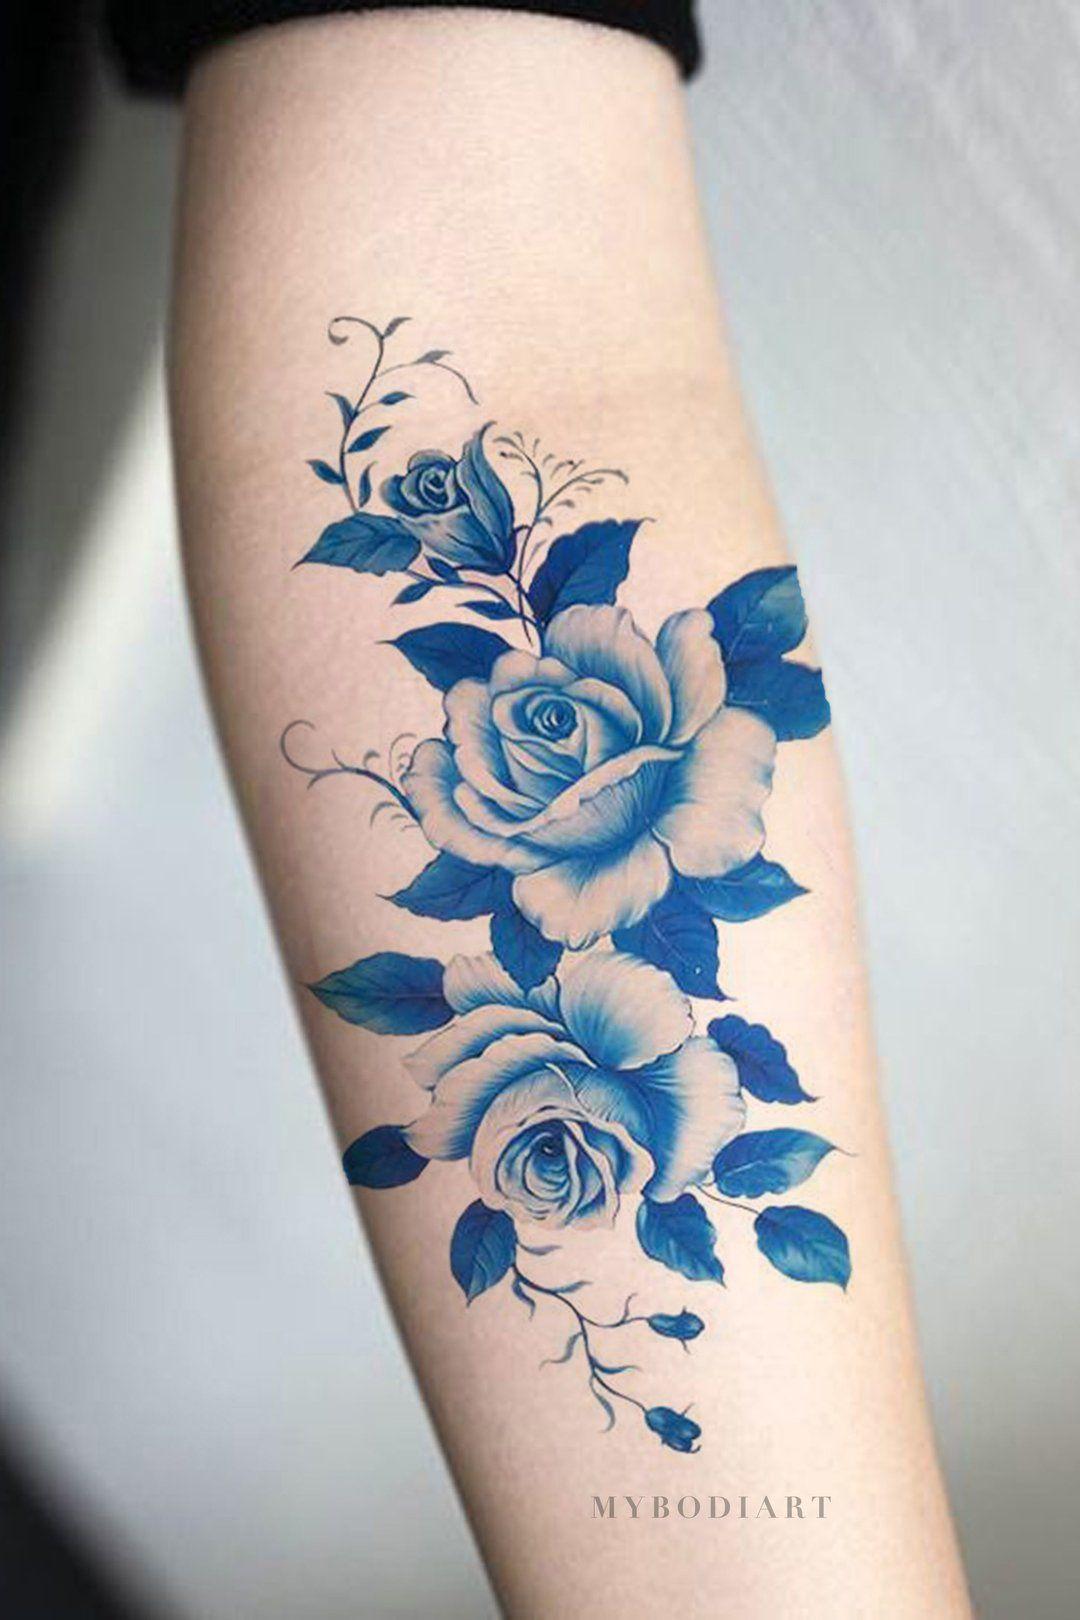 6 Sheets Wrist Body Art Henna Tattoo Stencil Flower: Product Information Product Type: Tattoo Sheet Tattoo